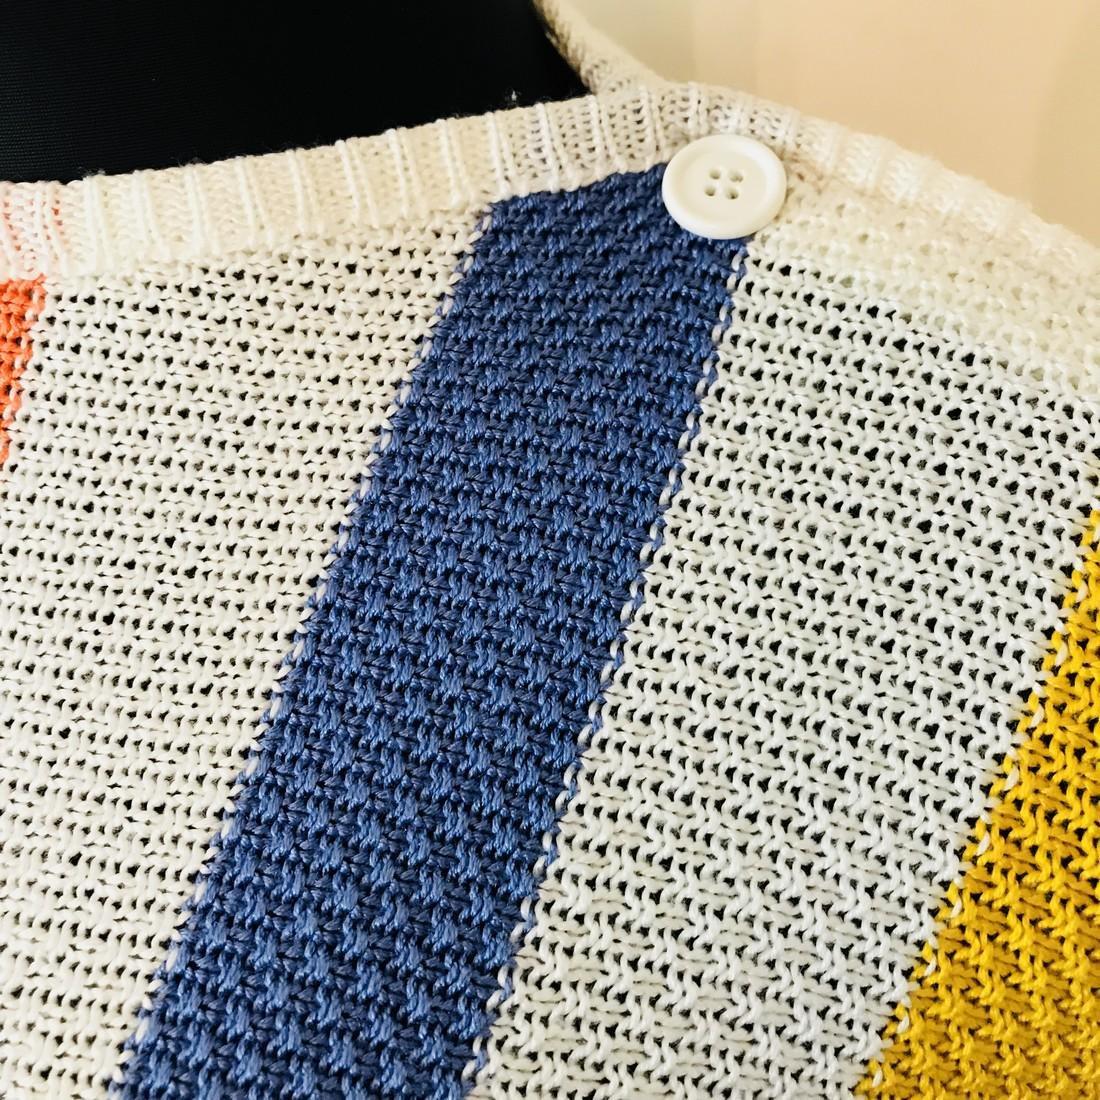 Vintage Women's MOSAIK Crochet Sweater Size EUR 40 US - 3